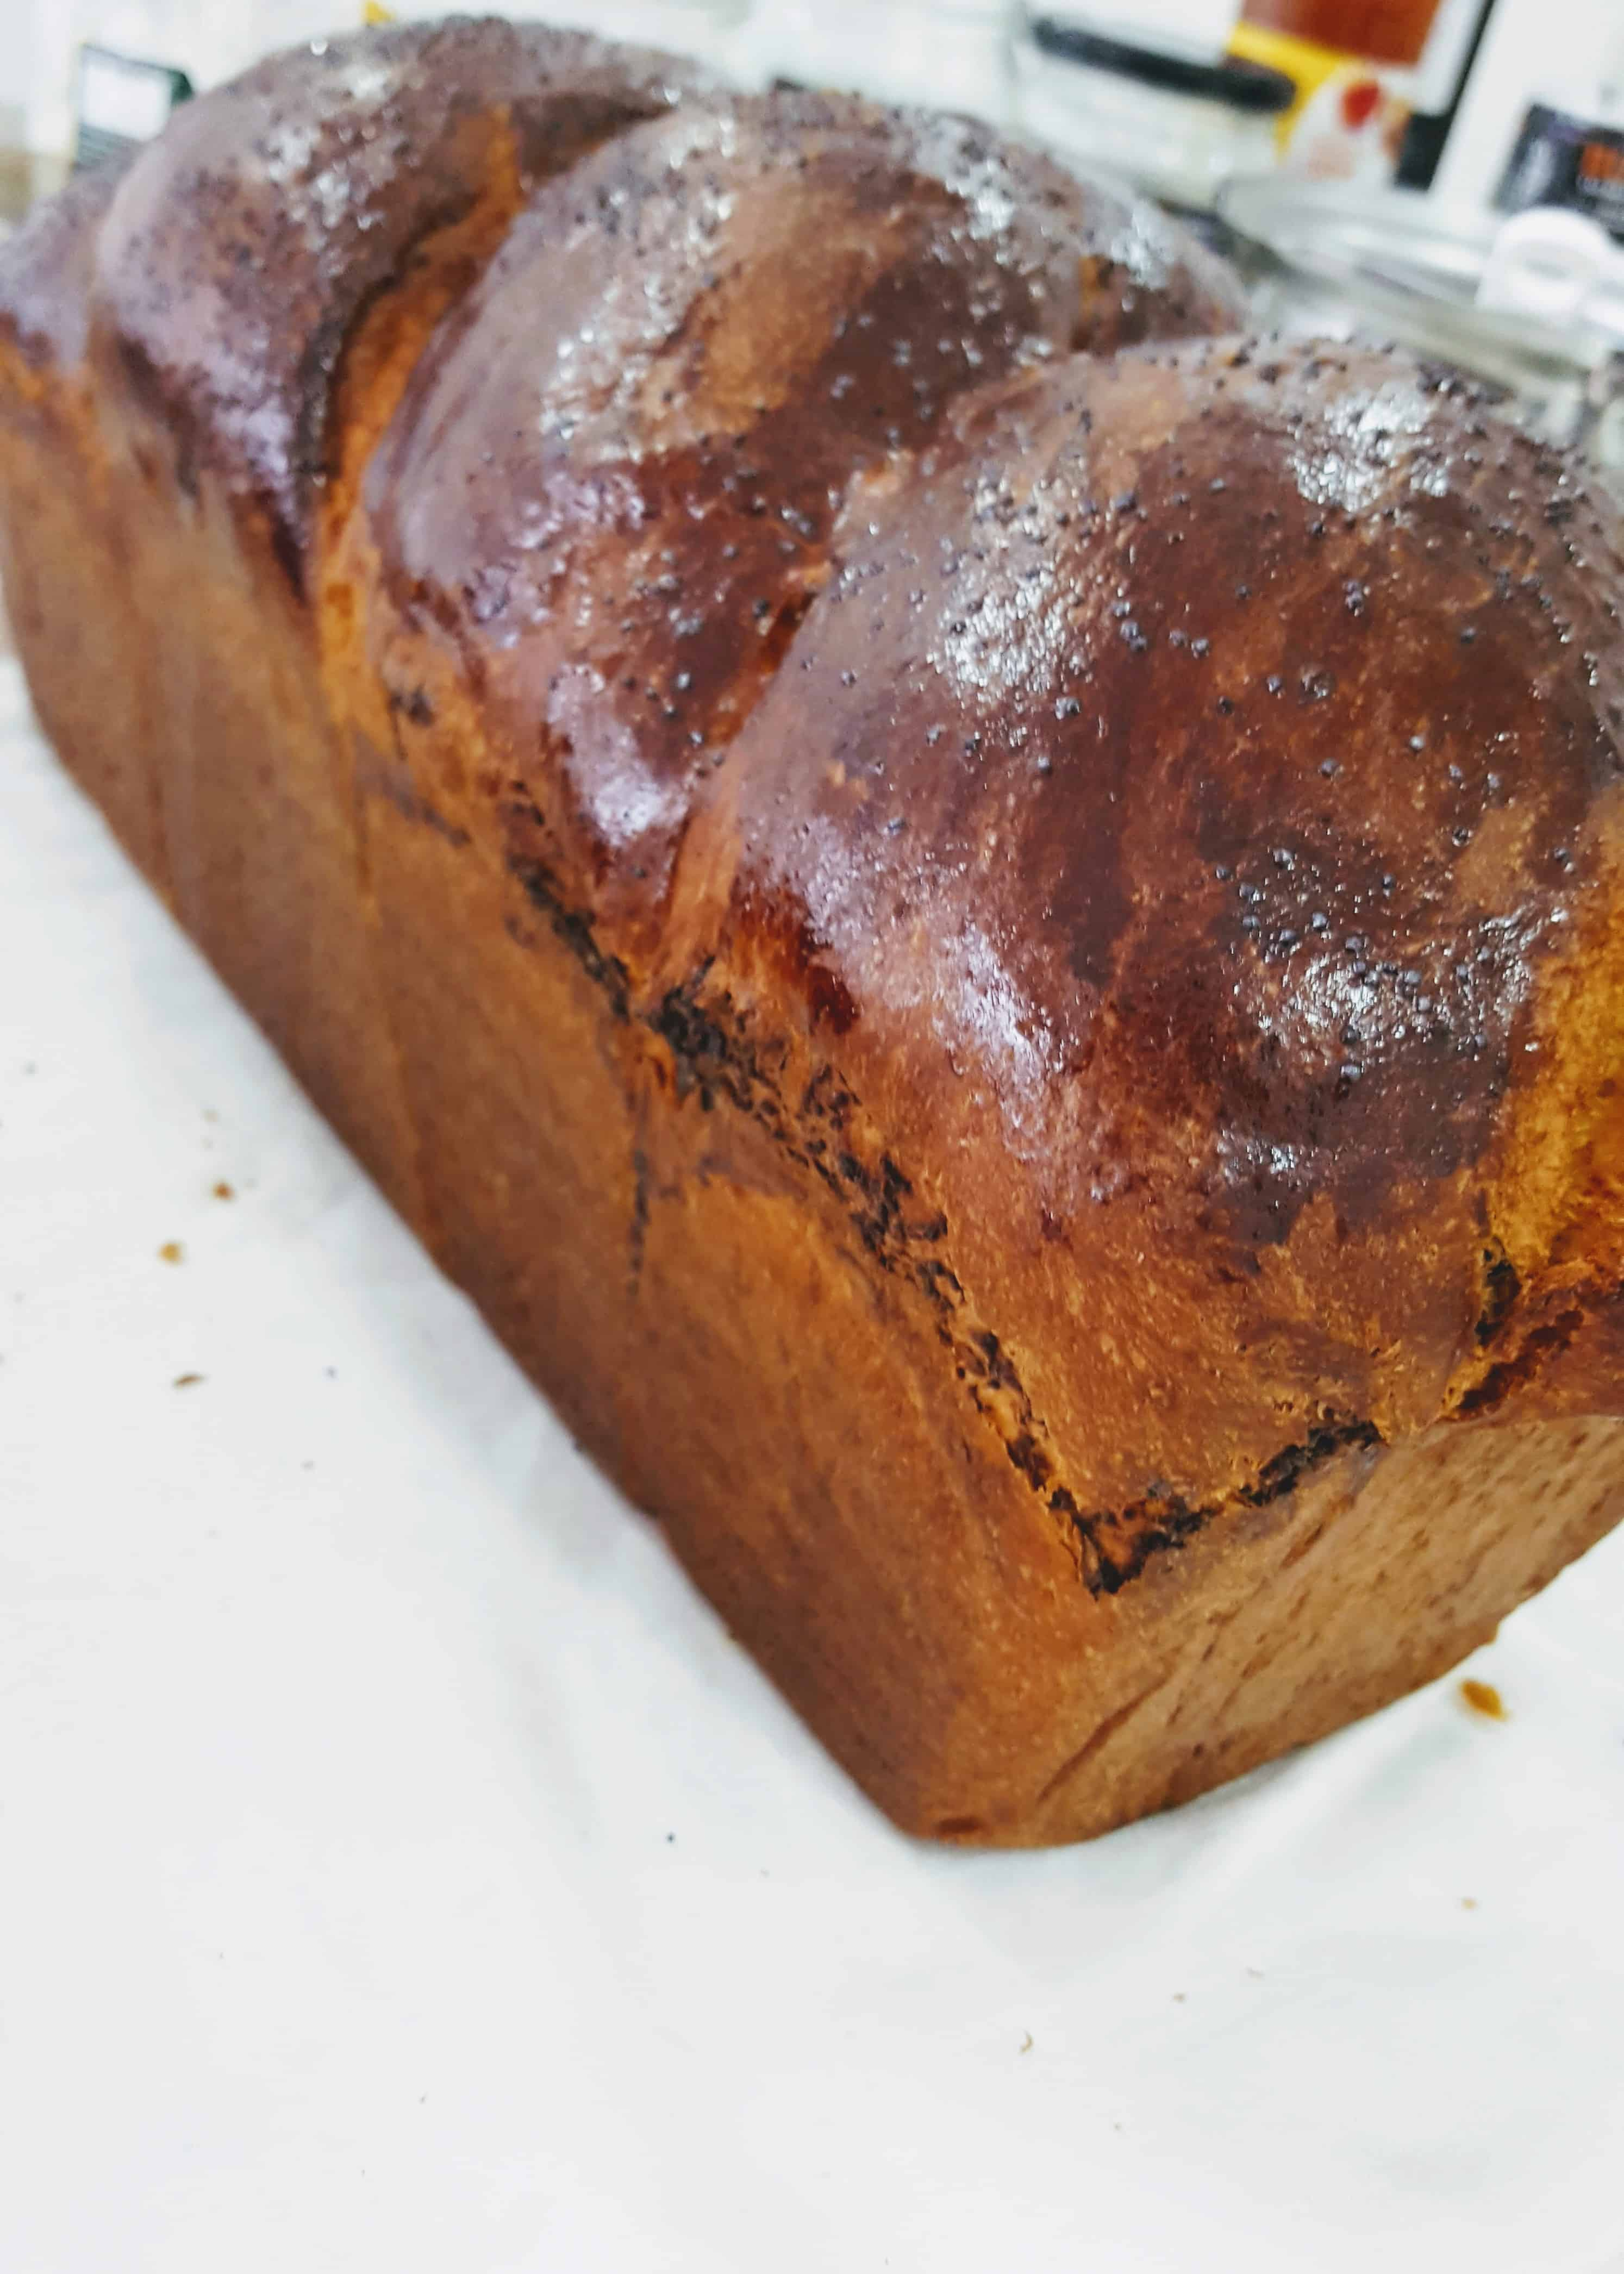 Cozonac de casa cu nuca - fara amelioratori/fara margarina - 0,8kg 4